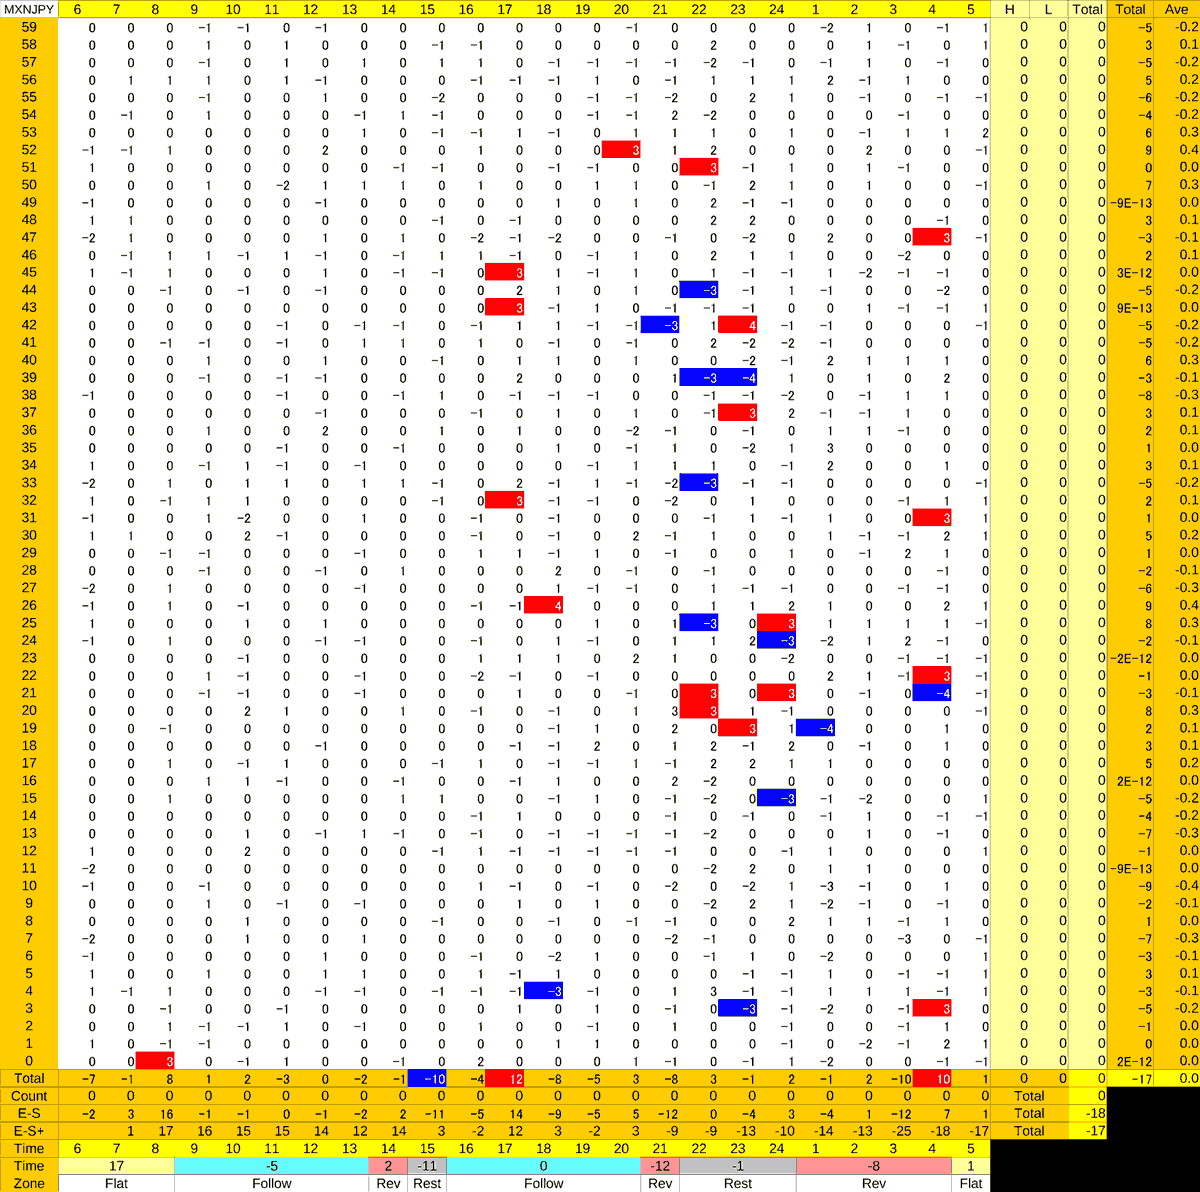 20210209_HS(3)MXNJPY